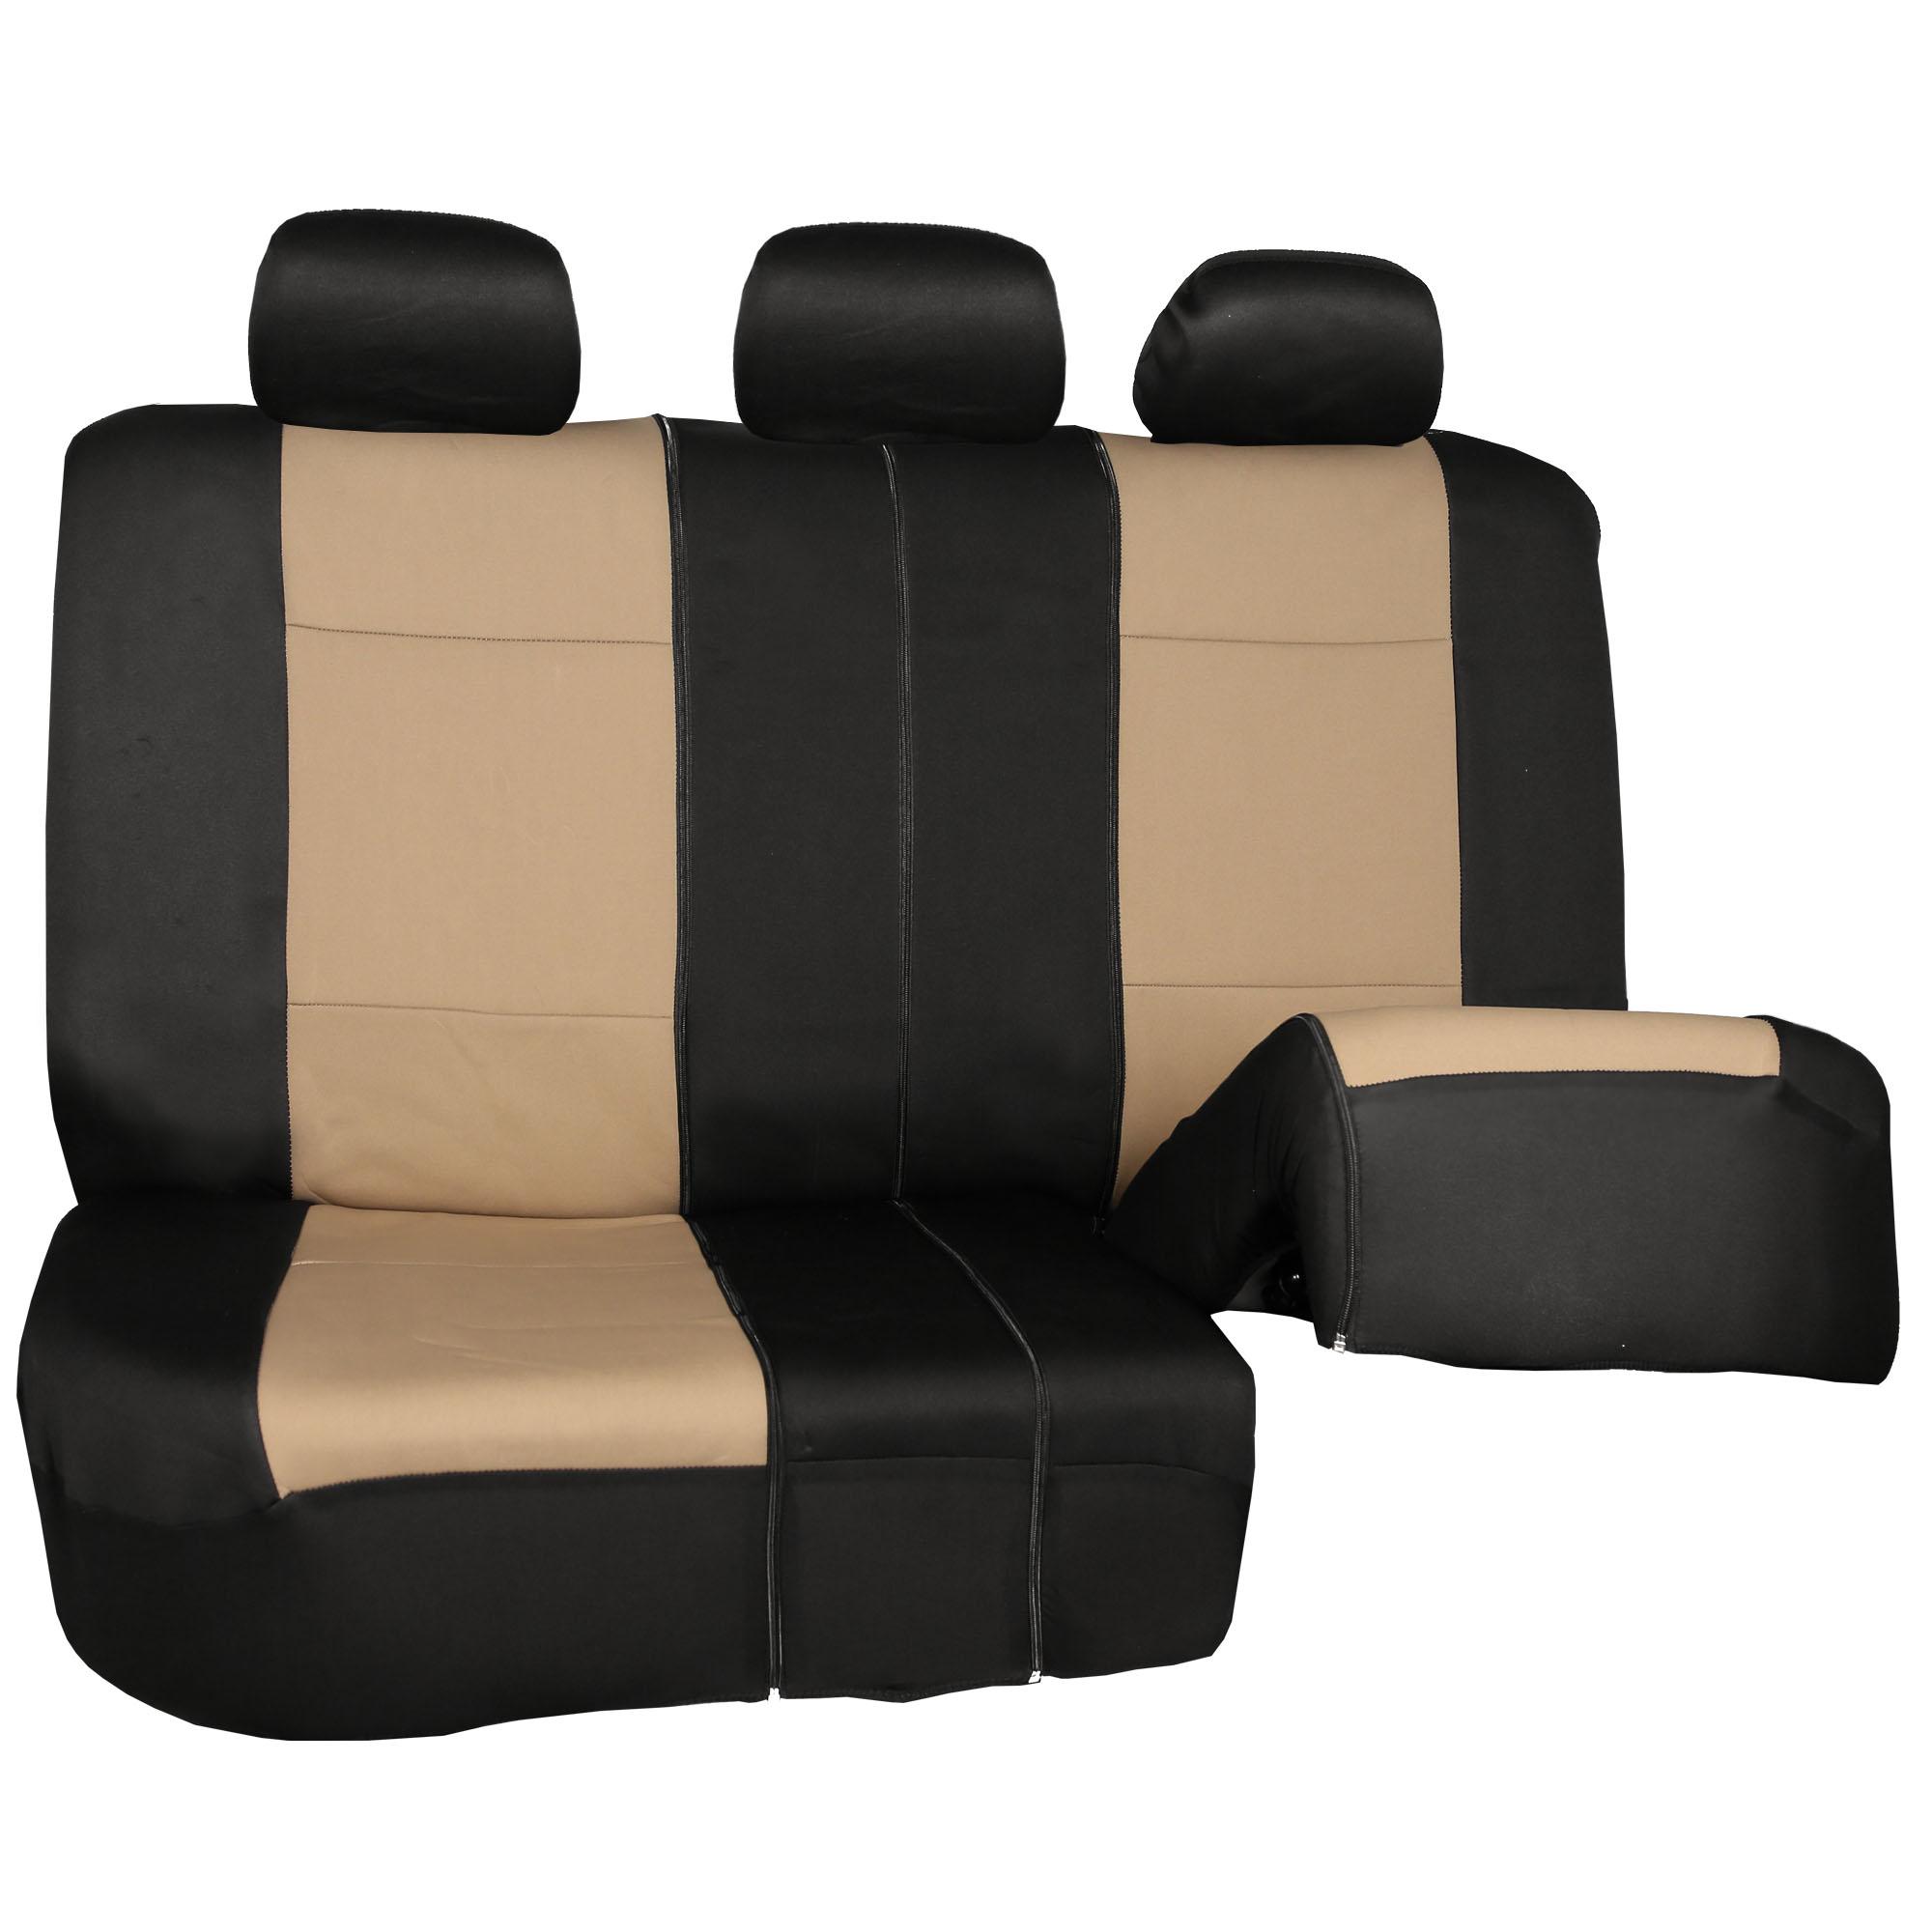 Neoprene Car Seat Covers With Gray Floor Mats Combo Full